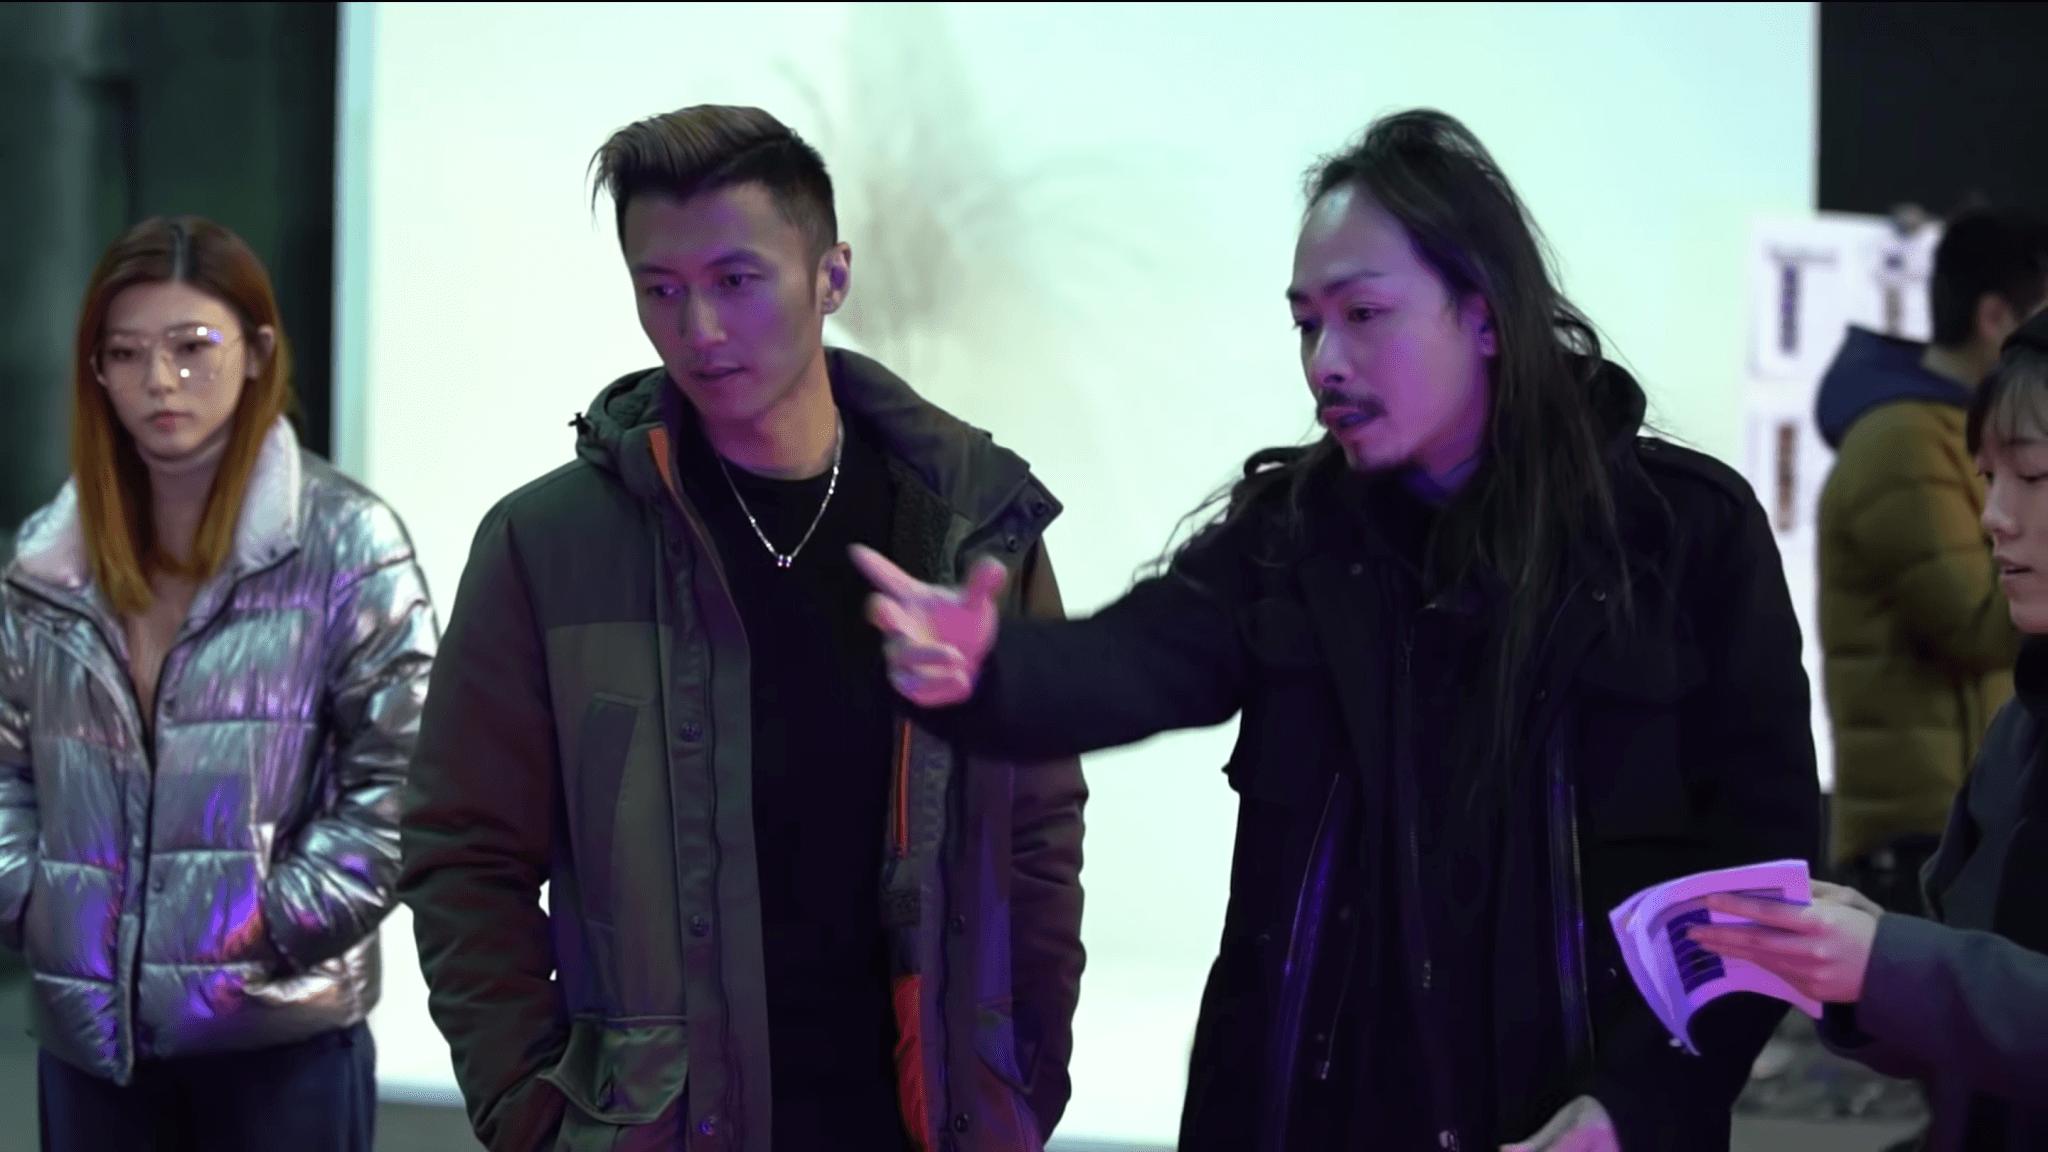 Chloe幫謝霆鋒拍攝〈放肆〉MV時,與歌手和導演皆合作無間。